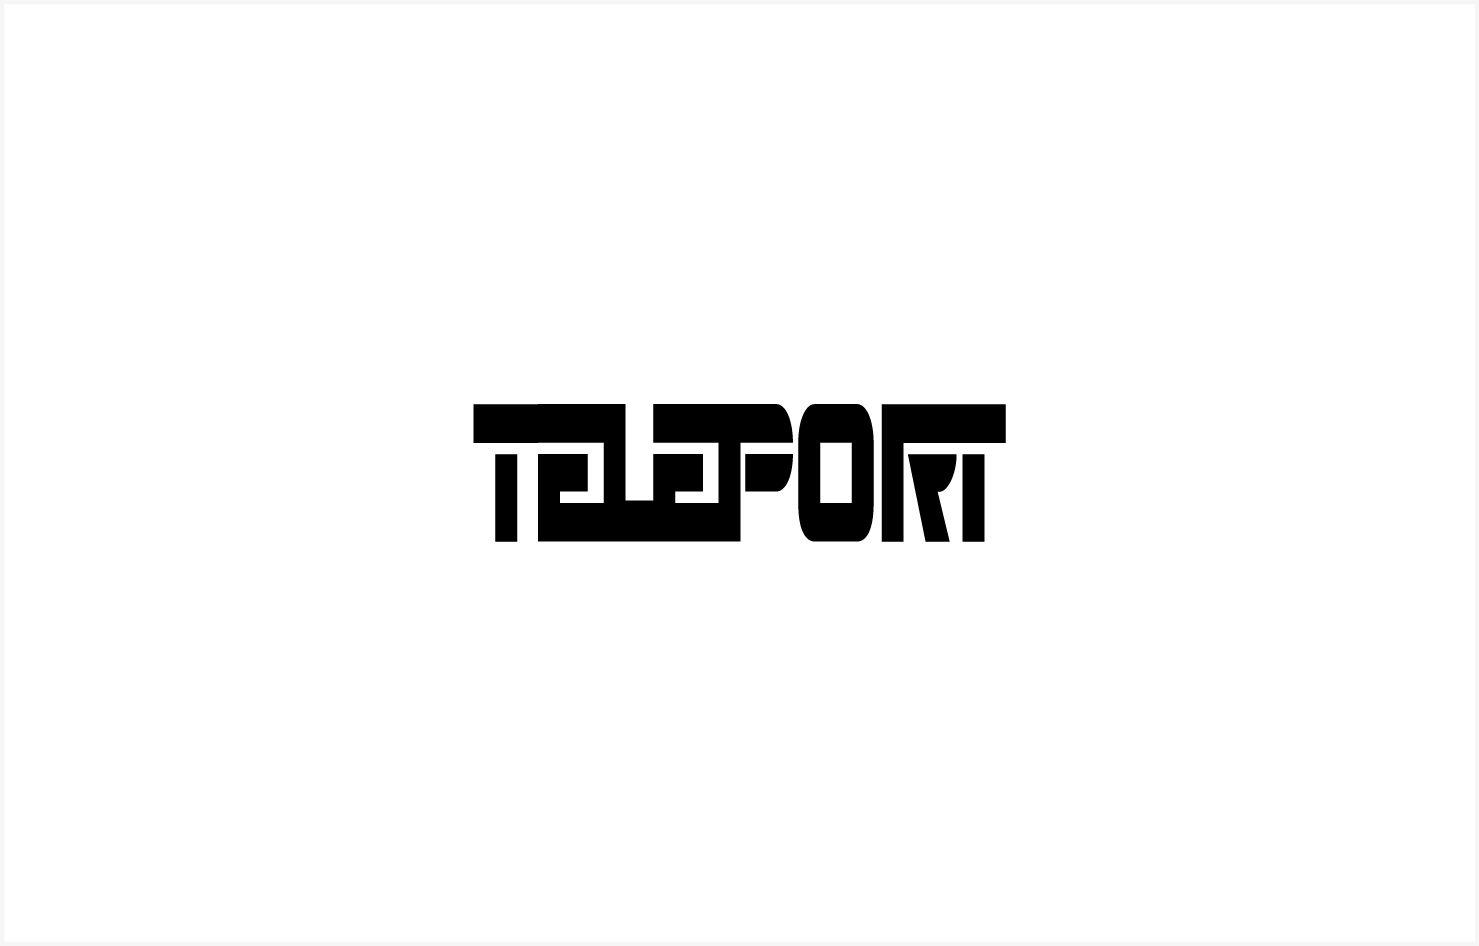 Логотип для Телепорт - дизайнер BELL888